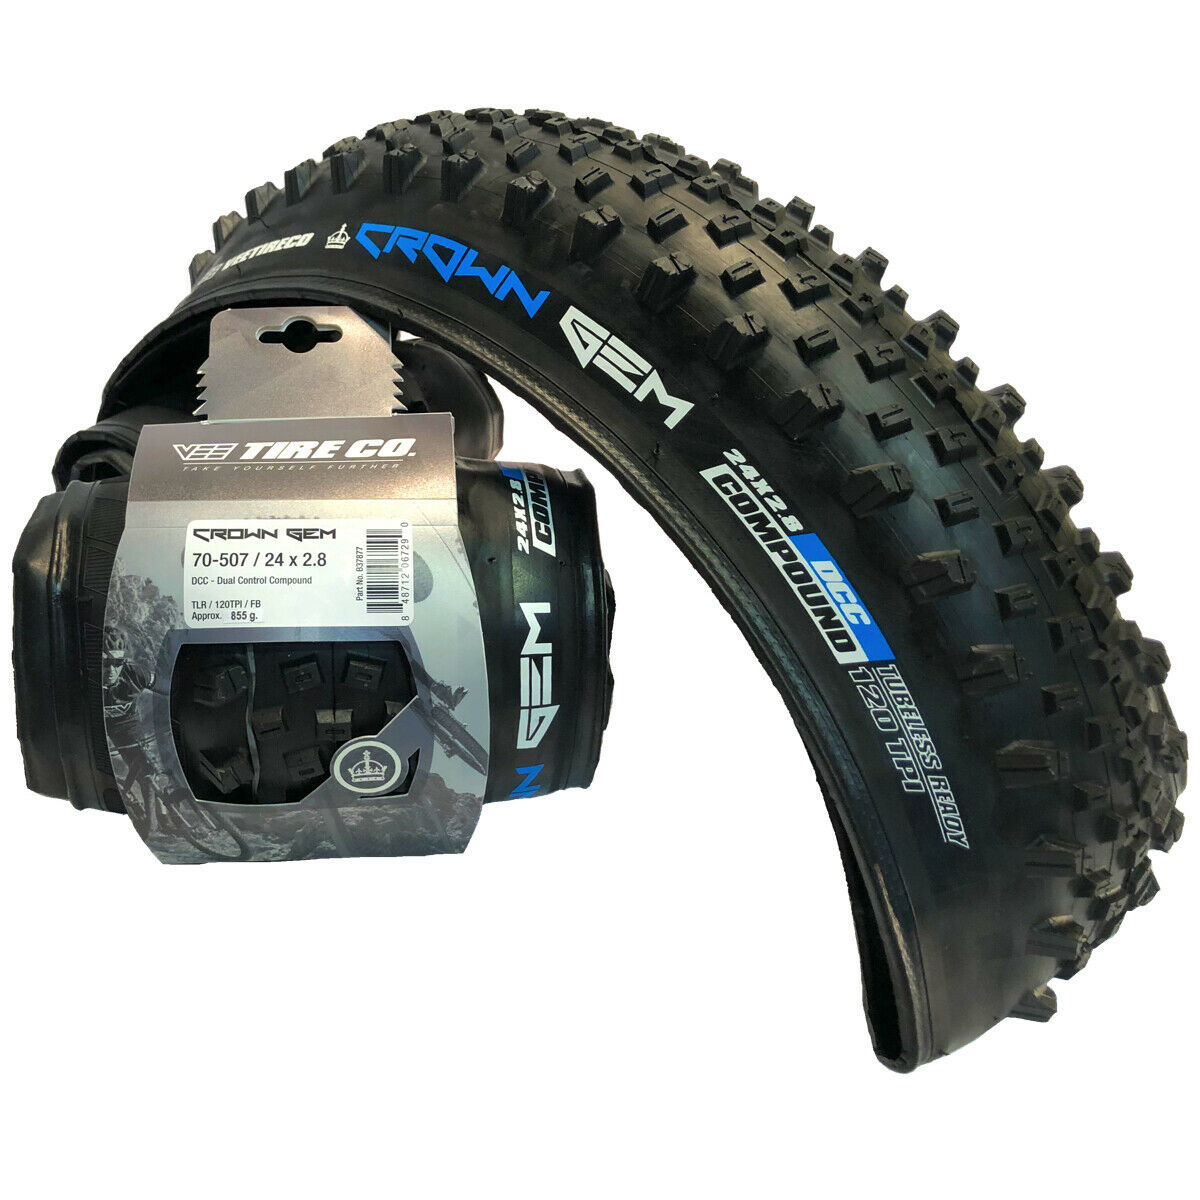 2 Vee Tire  Crown Gem Bike Tire with Folding Bead Dual Control Compound (24x2.8)  10 days return